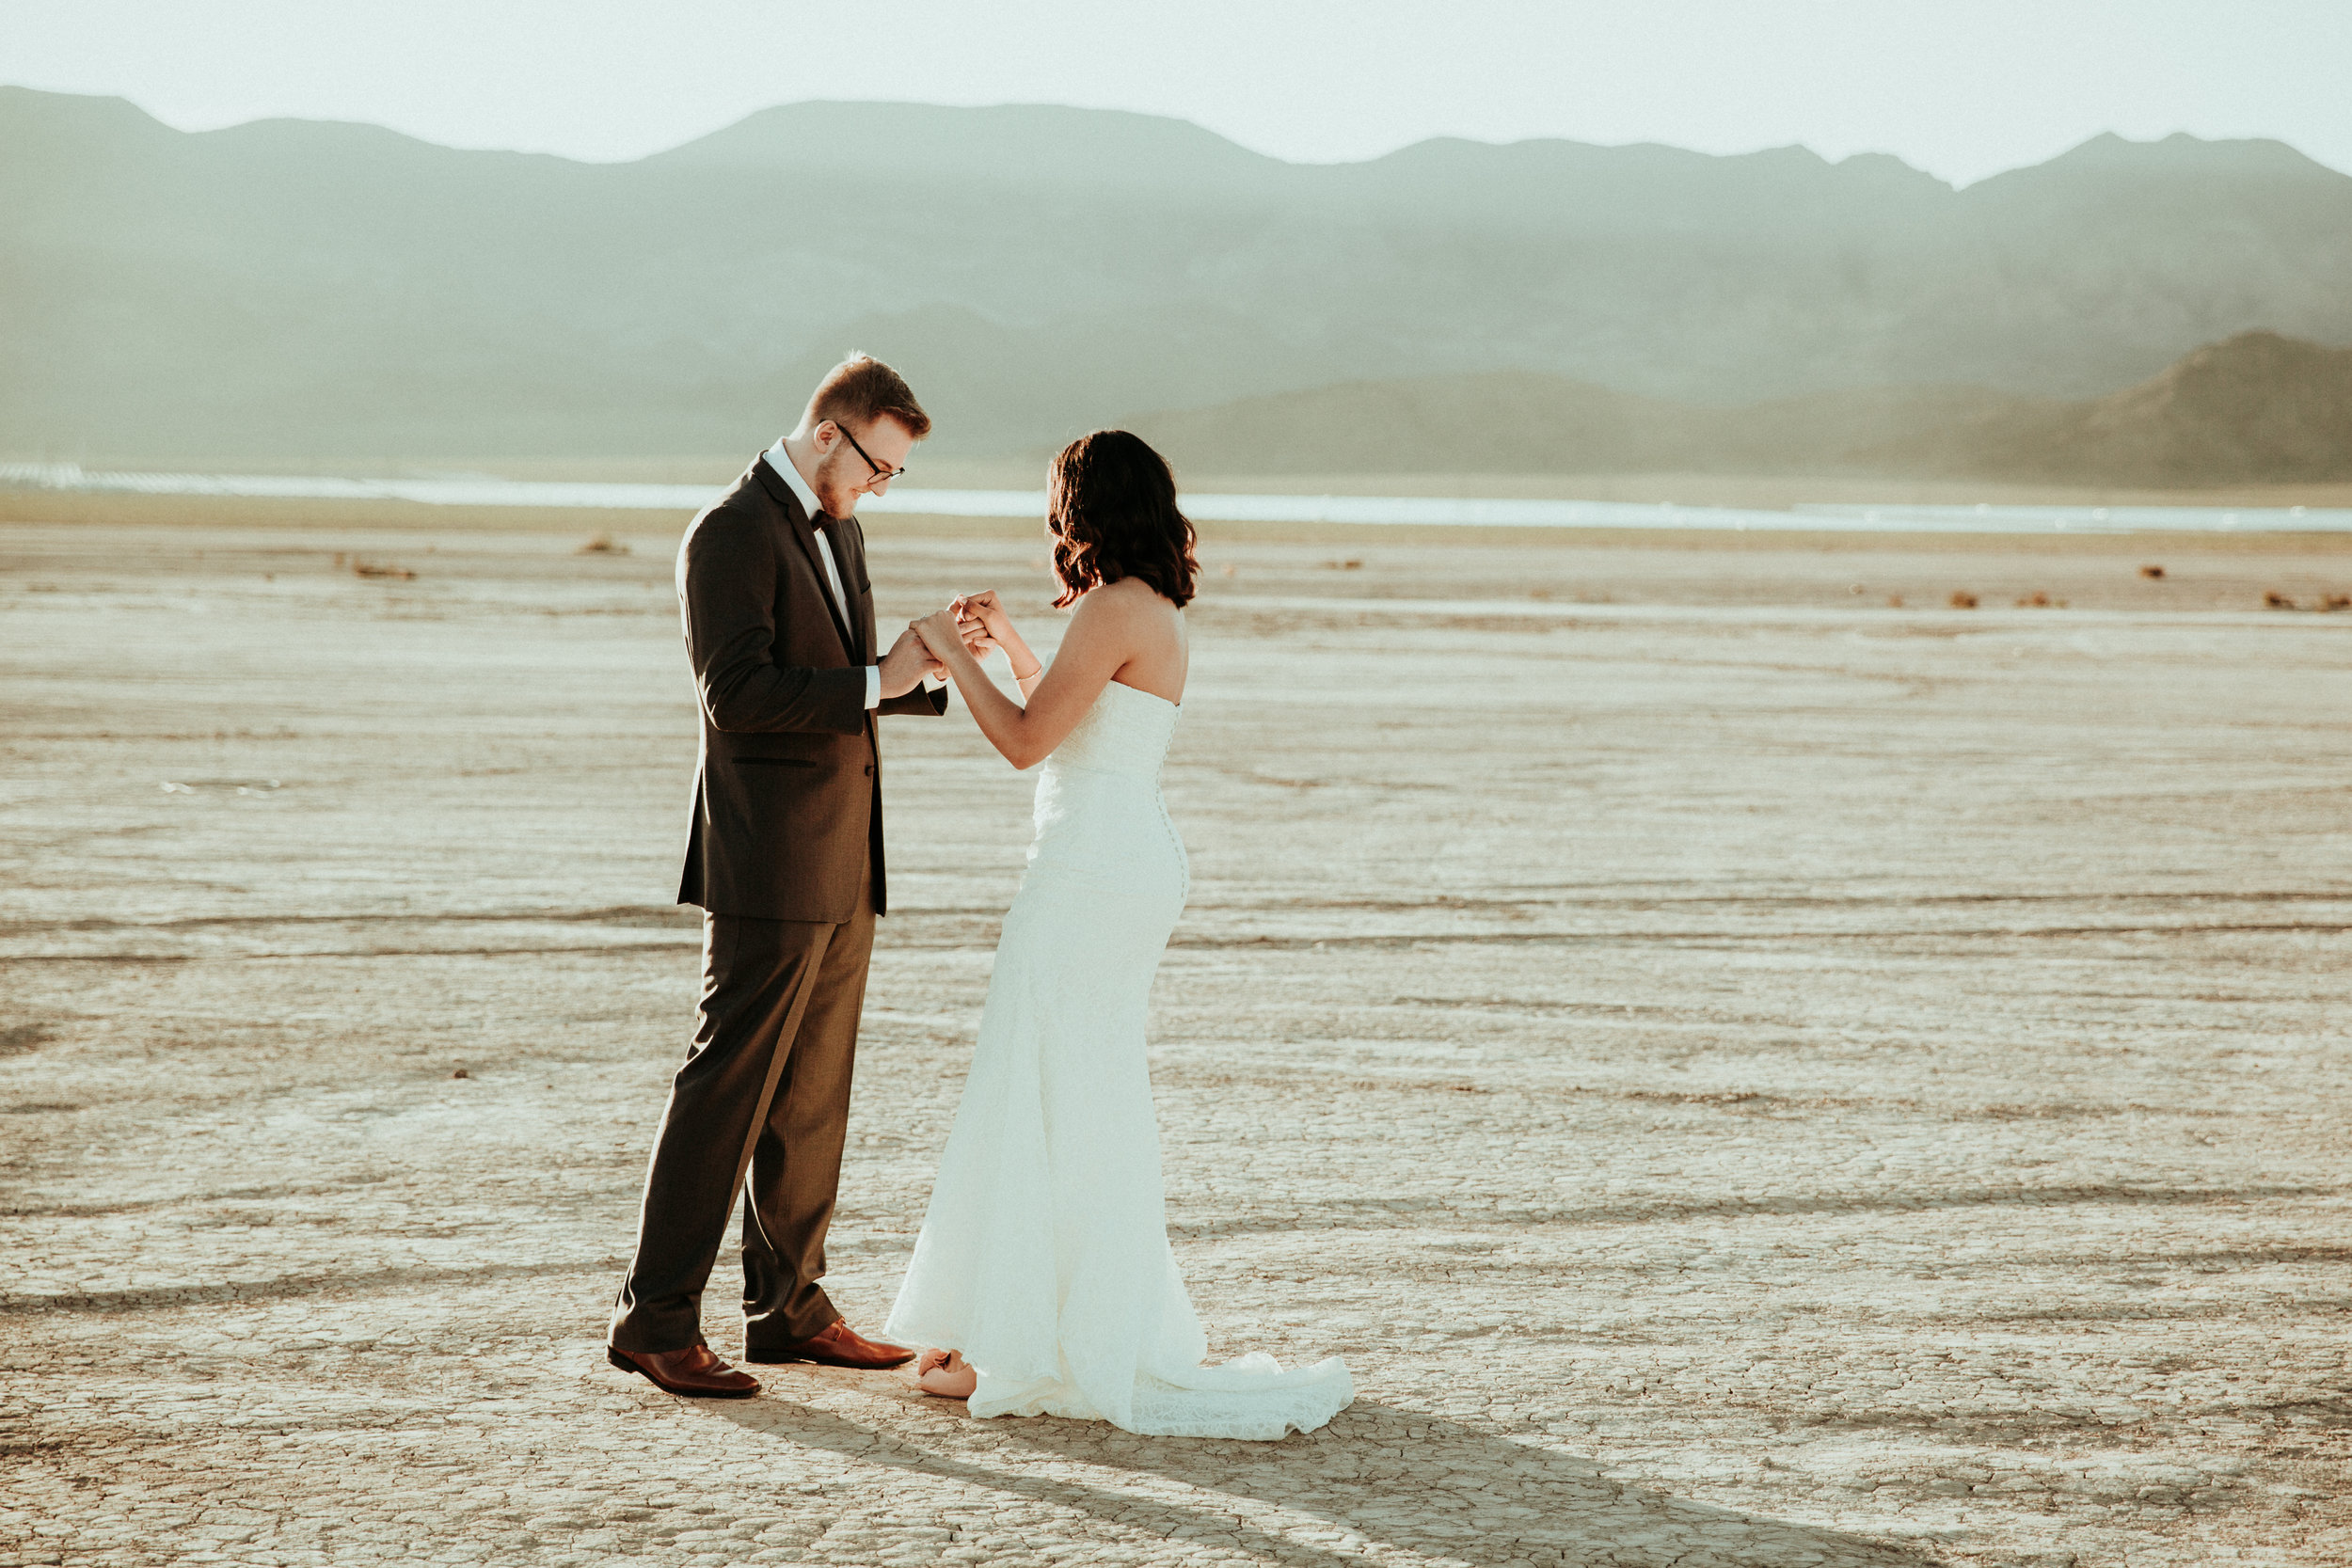 California Wedding Photographer - Seattle Wedding Photography - Nevada Wedding Photographer - Destination Wedding Photographer - Washington Elopement Photographer - Oregon Wedding Photographer - First Look